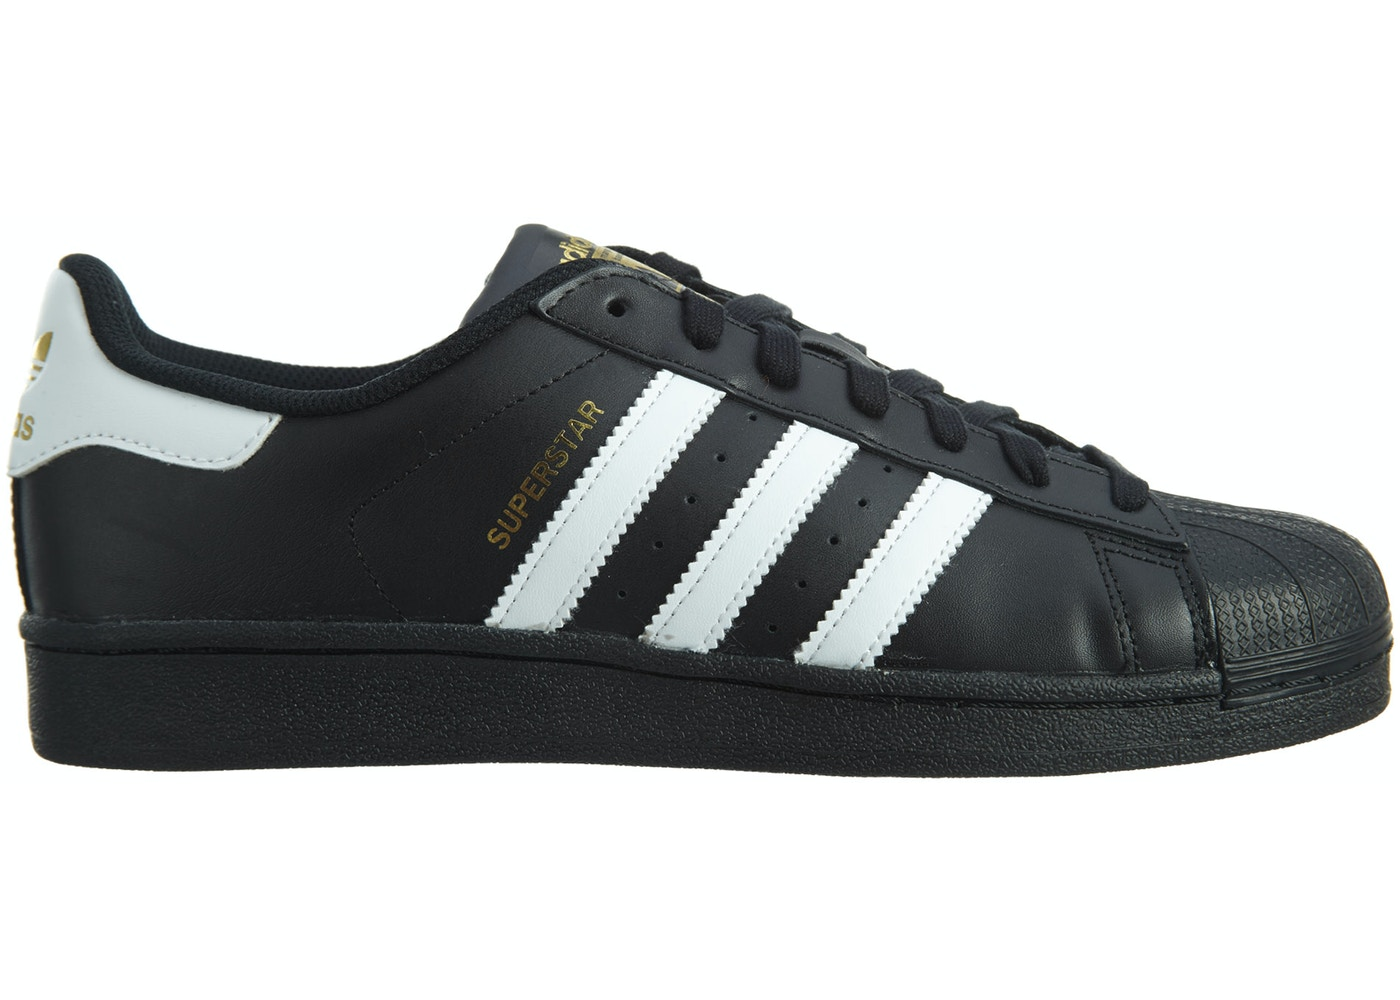 1eb517d4 adidas Superstar Foundation Black/White/Black - B27140